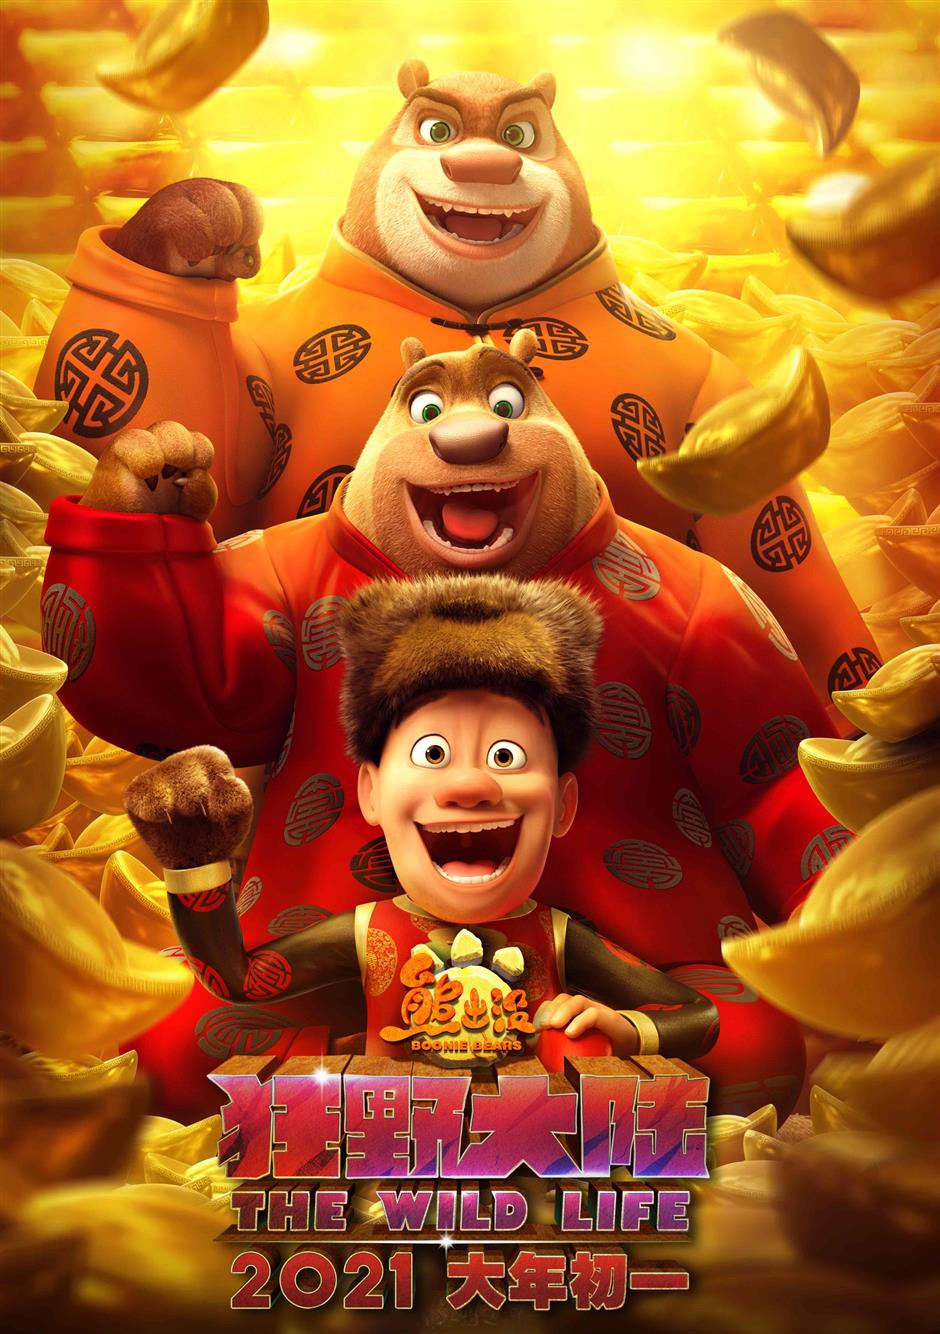 Presale movie tickets surpass US$46 million